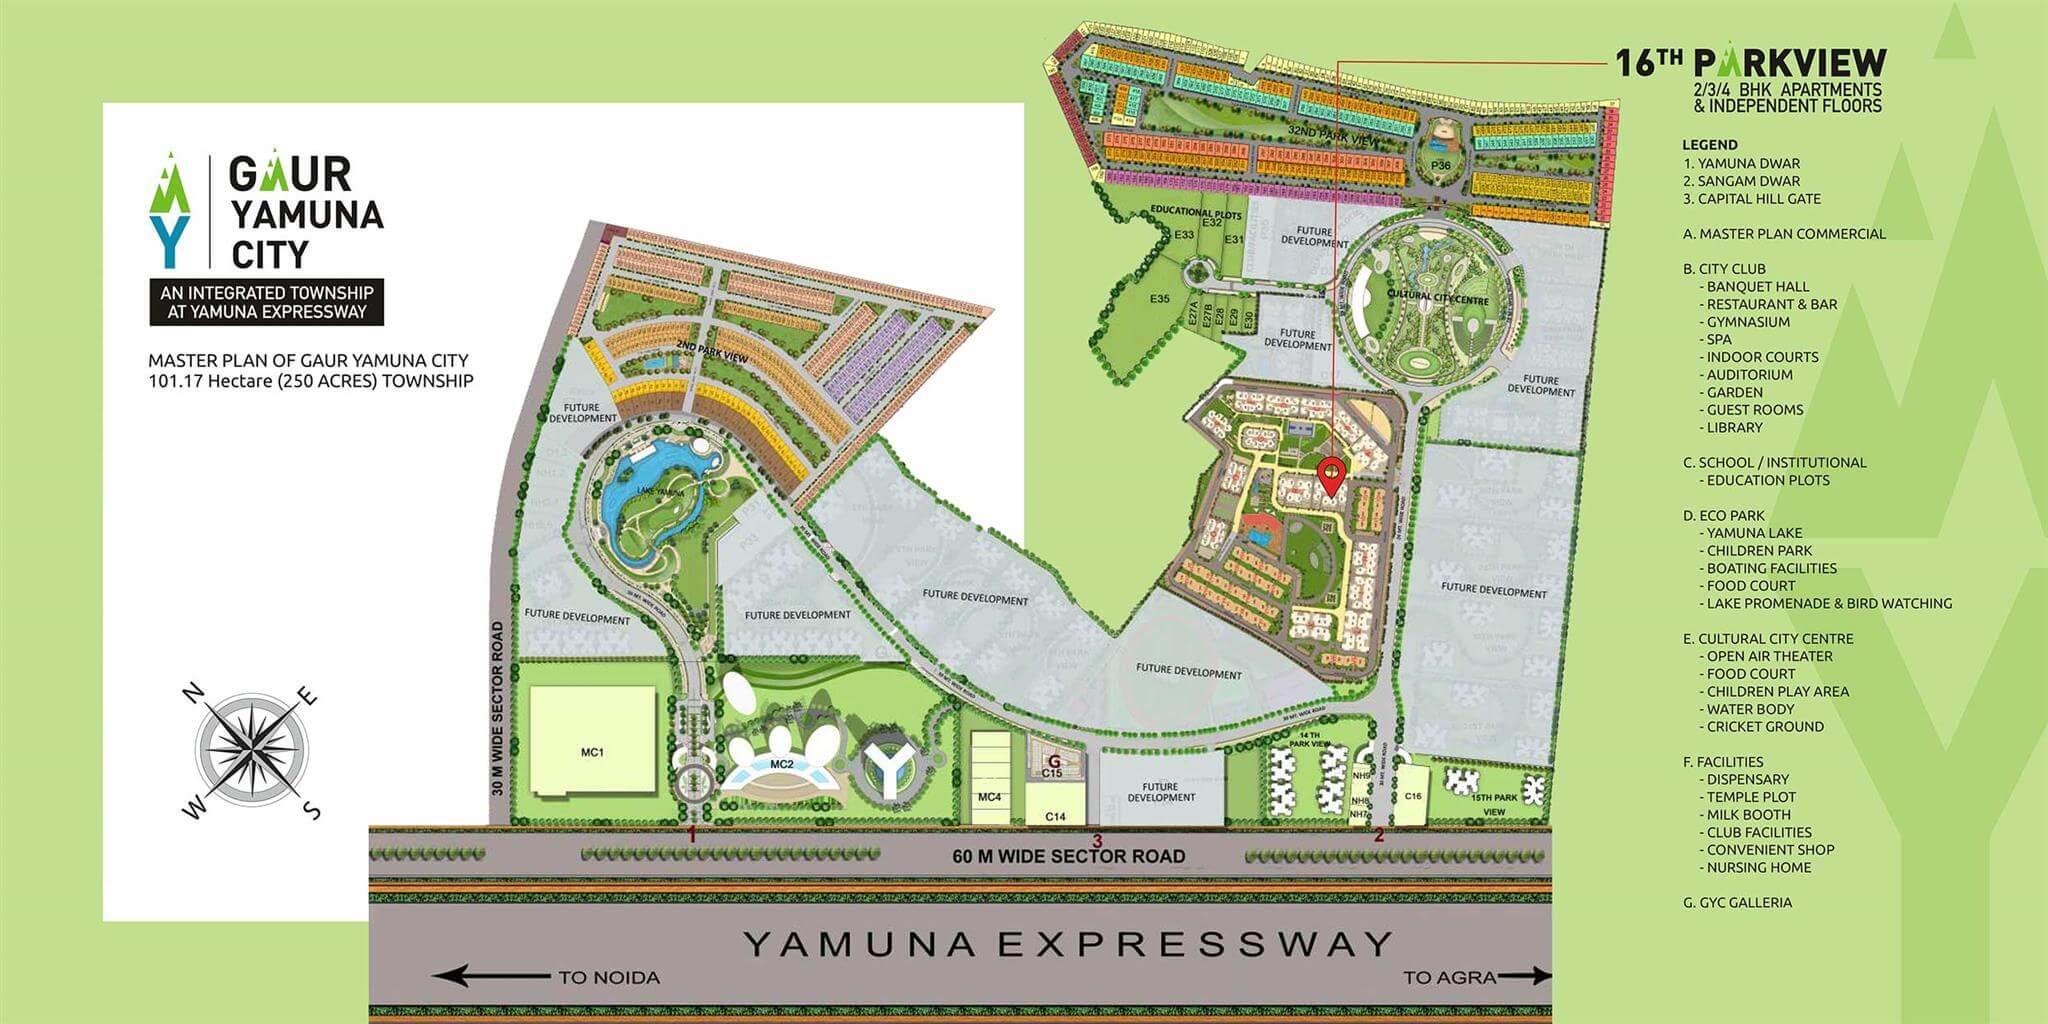 gaur yamuna city 16th park view master plan image1